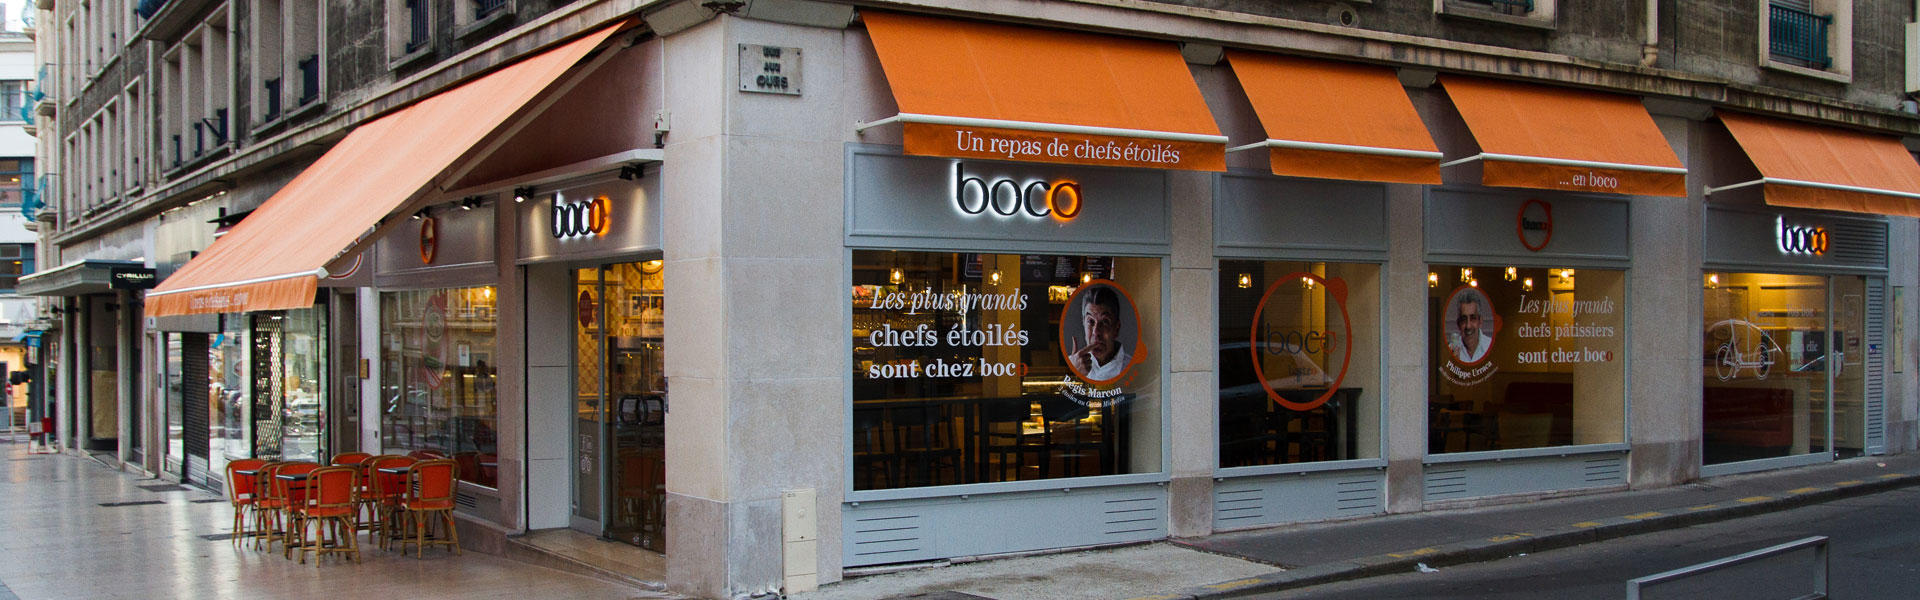 magasin boco rouen